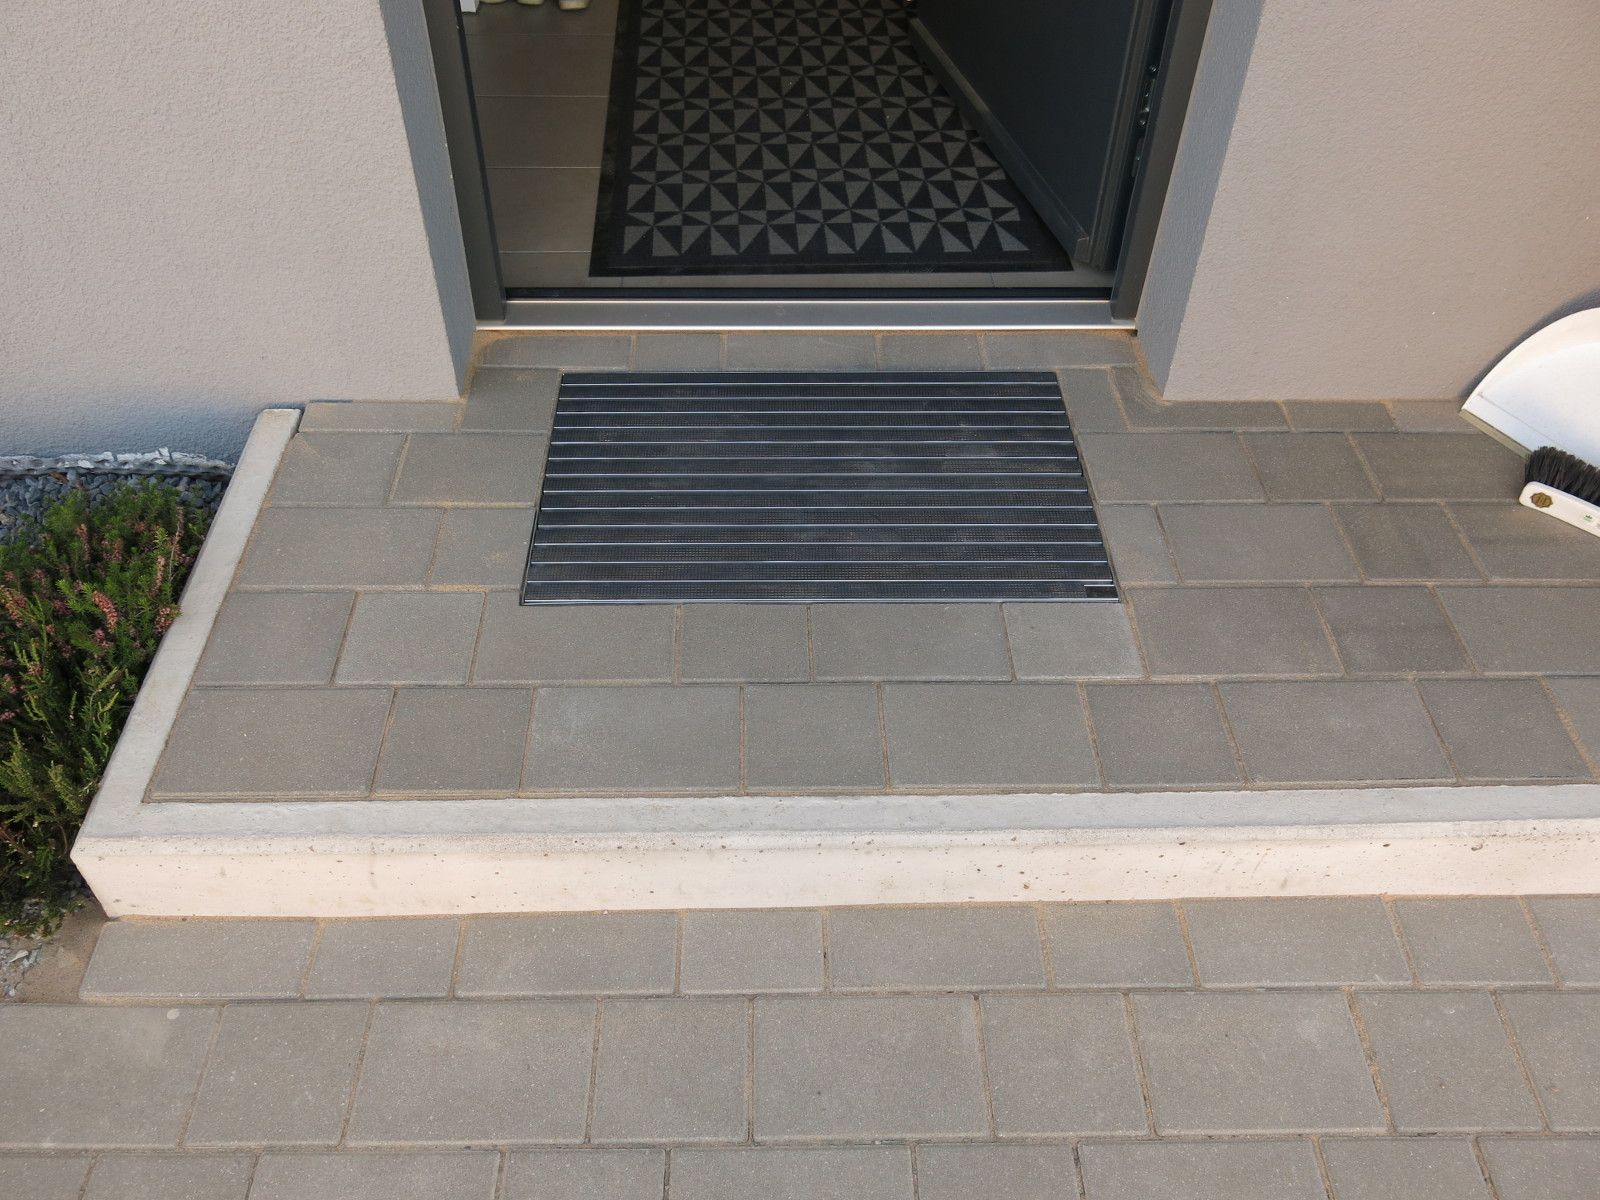 Diy Eingangspodest Mit Integriertem Schuhabstreifer Hauseingang Treppen Podest Eingang